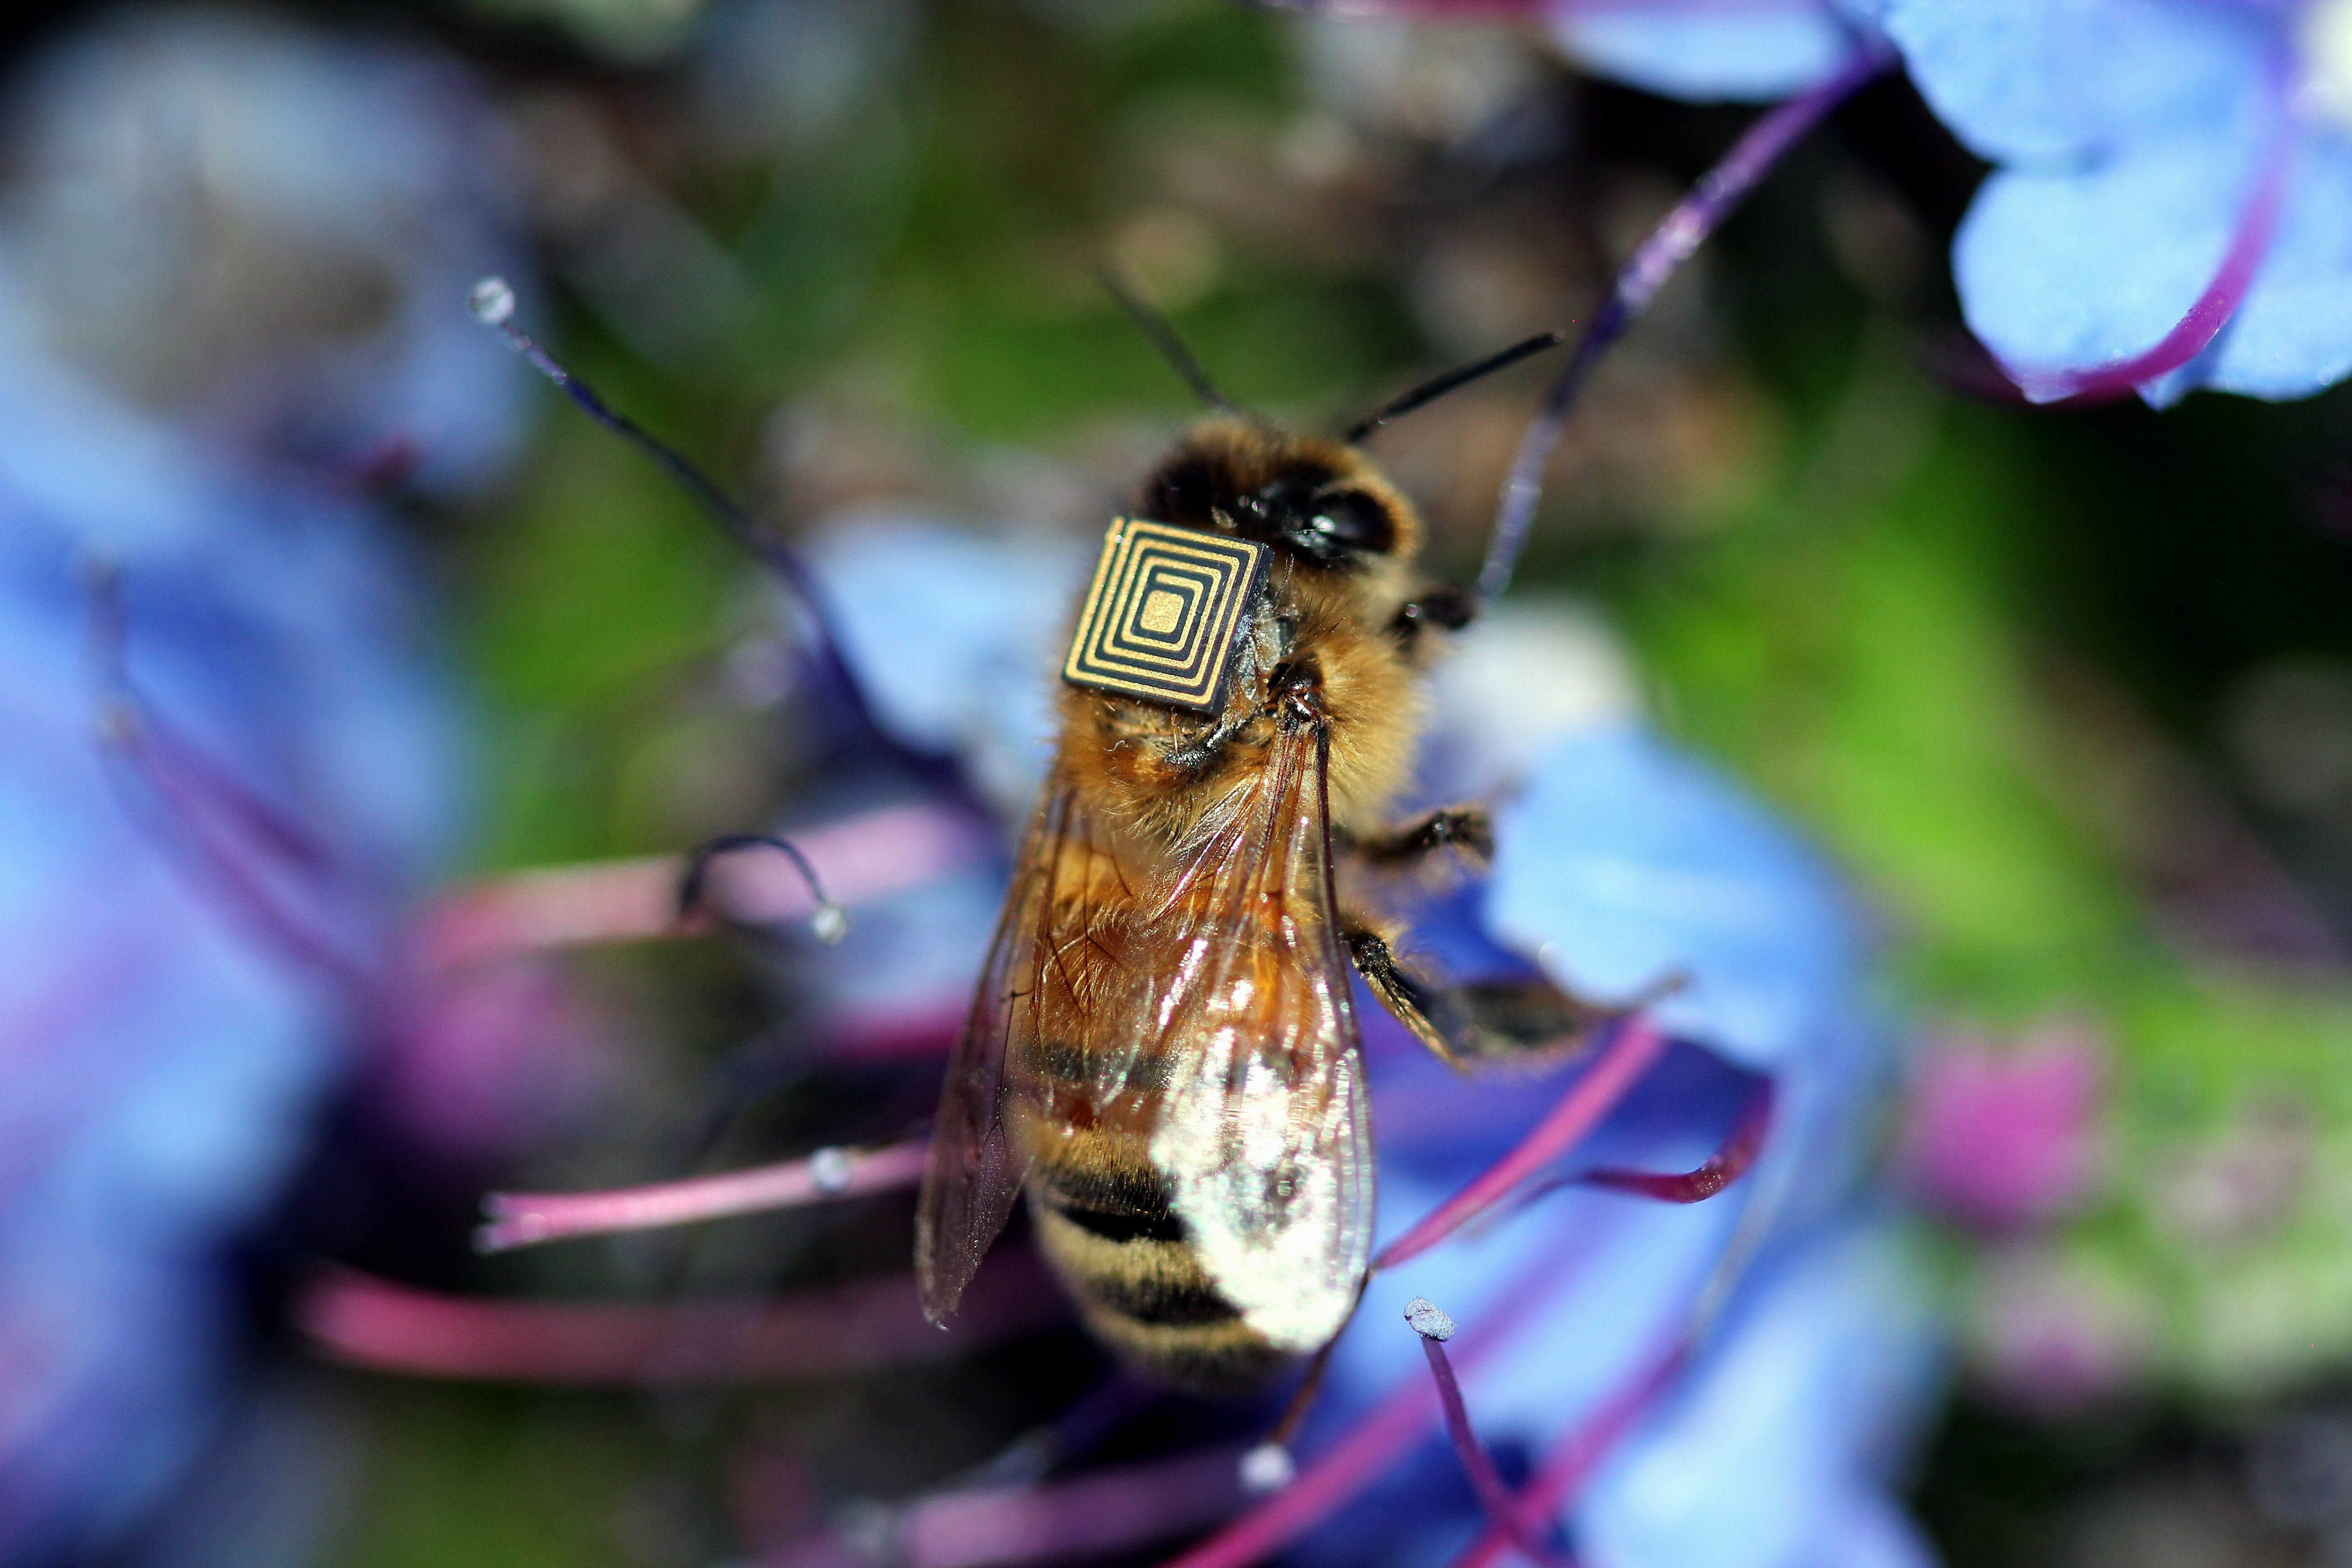 Australian Minute Bee (19 Wallpapers) – Free Wallpapers